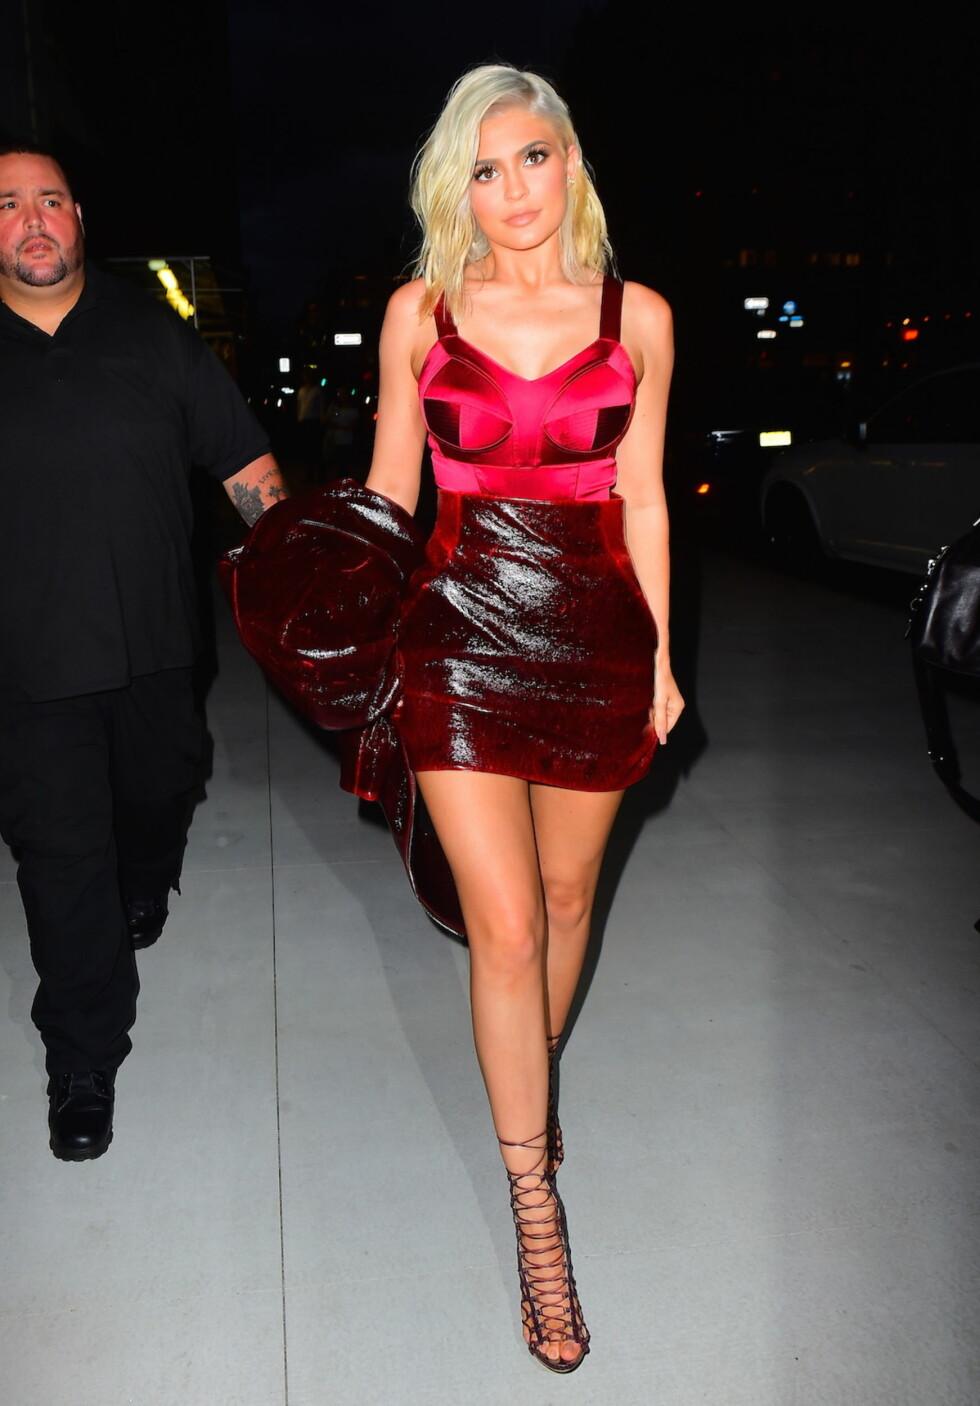 NYFW: Realitystjernen Kylie Jenner.  Foto: Splash News